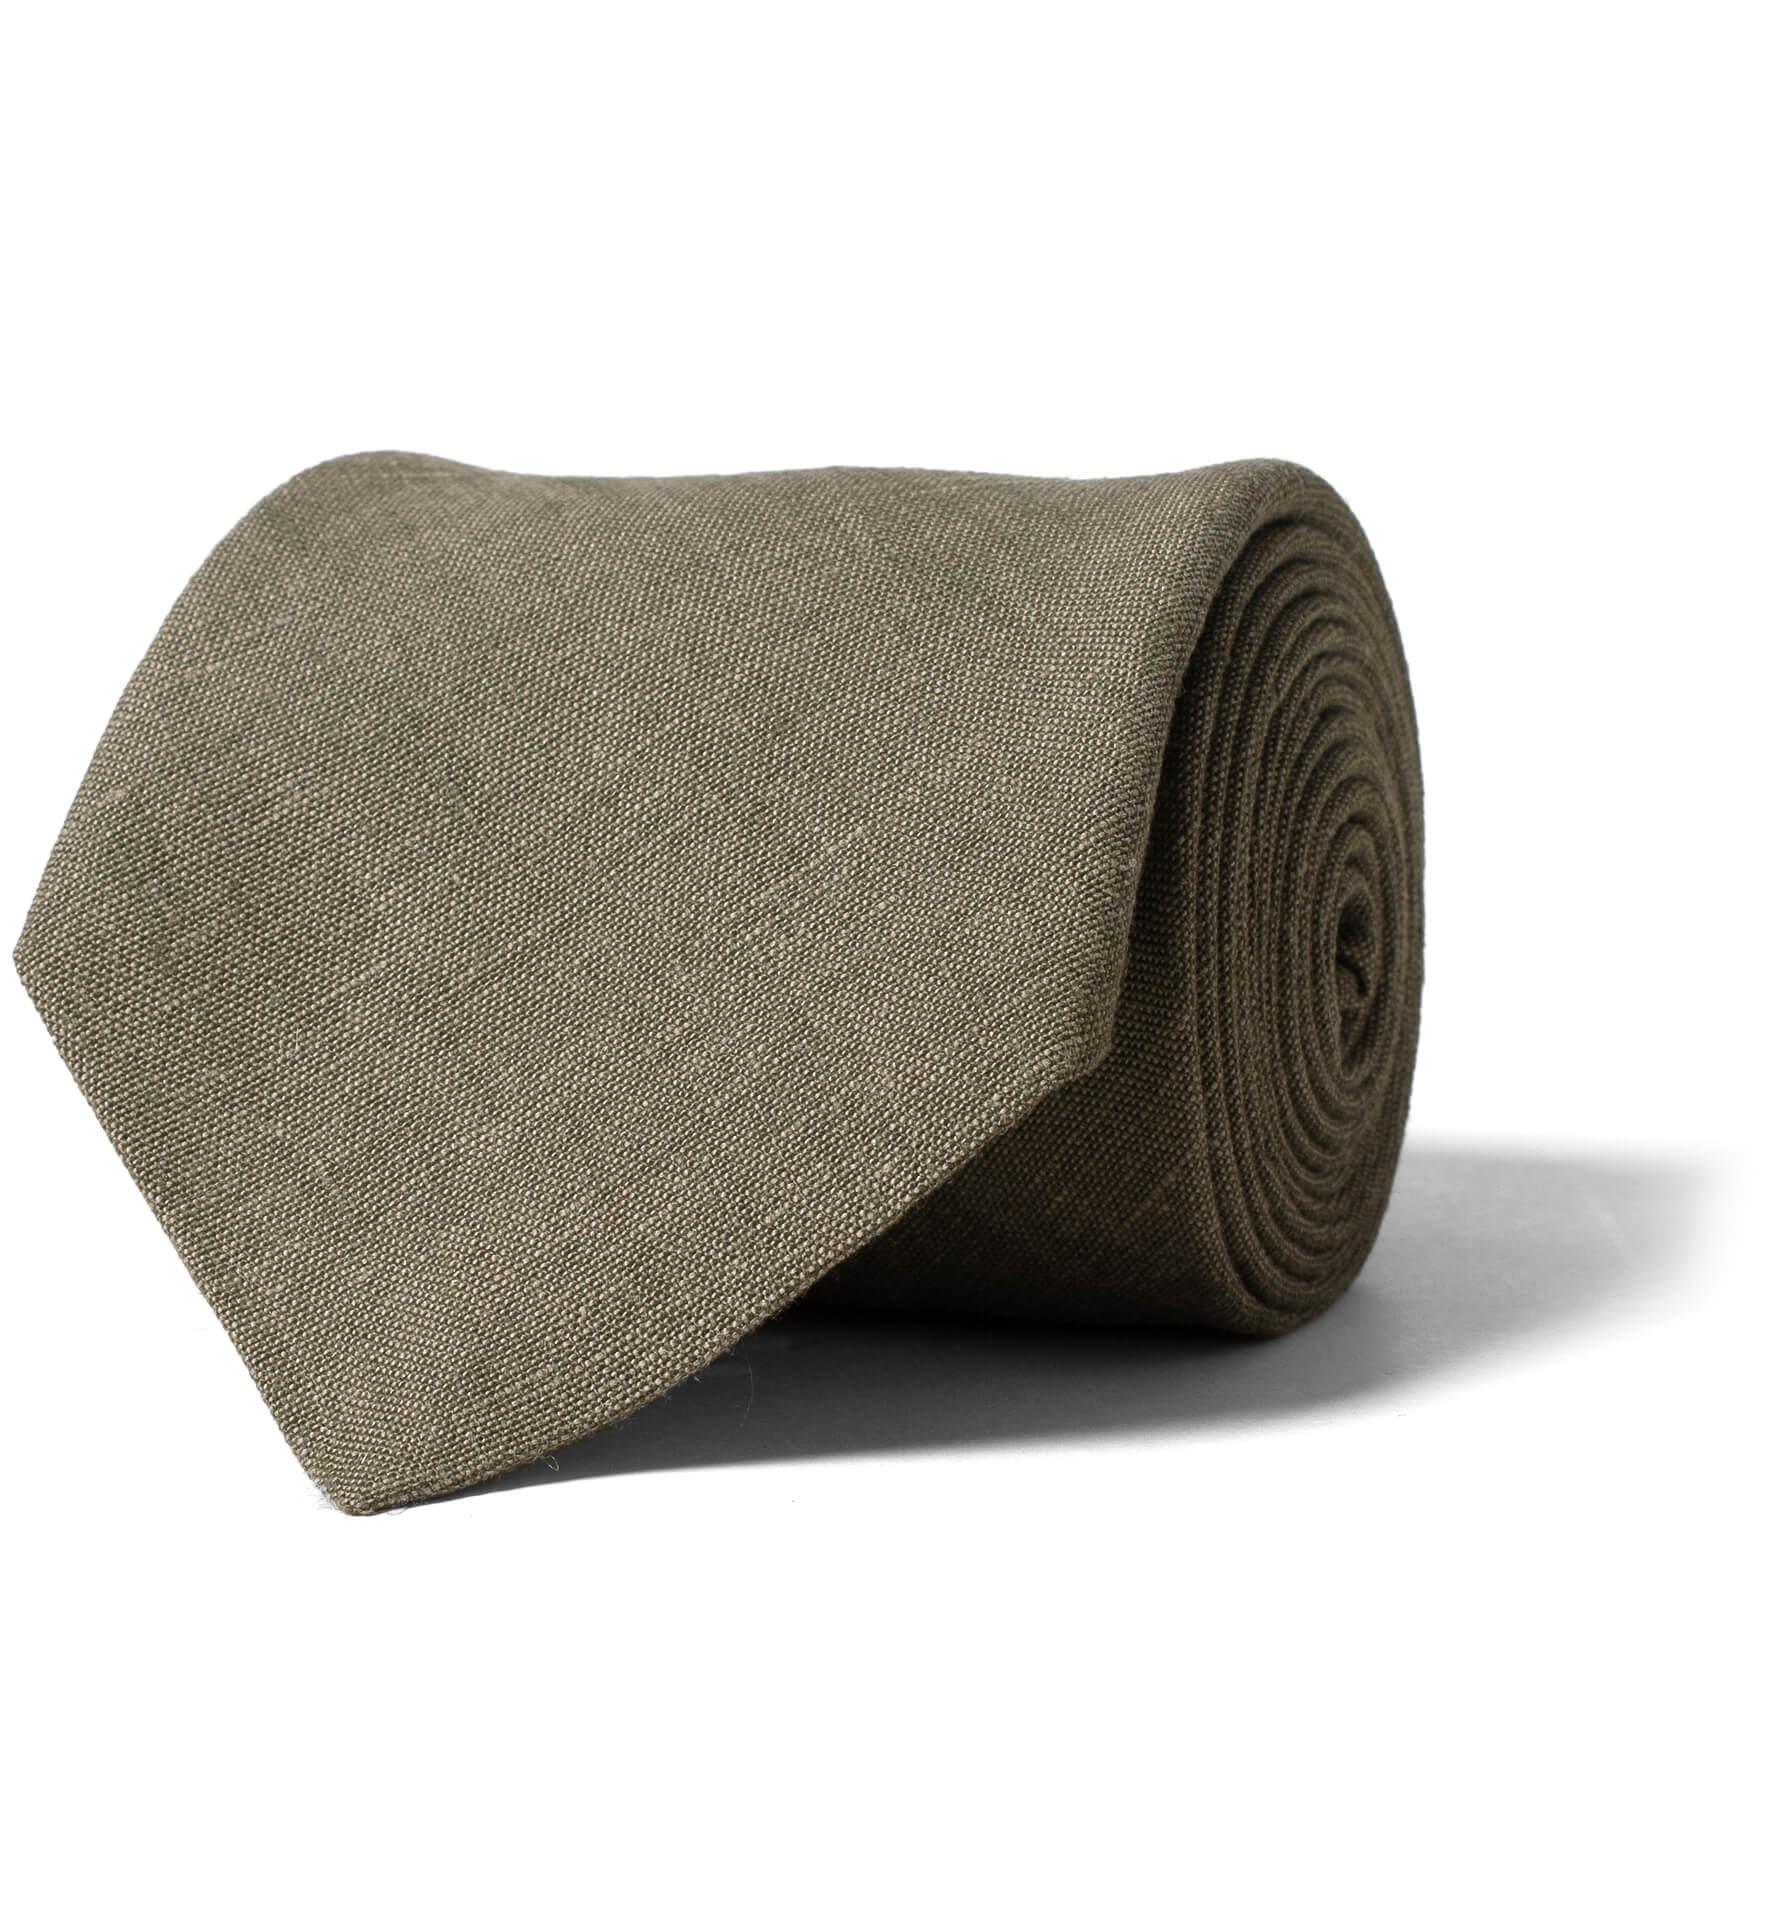 Zoom Image of Fatigue Green Solid Linen Tie